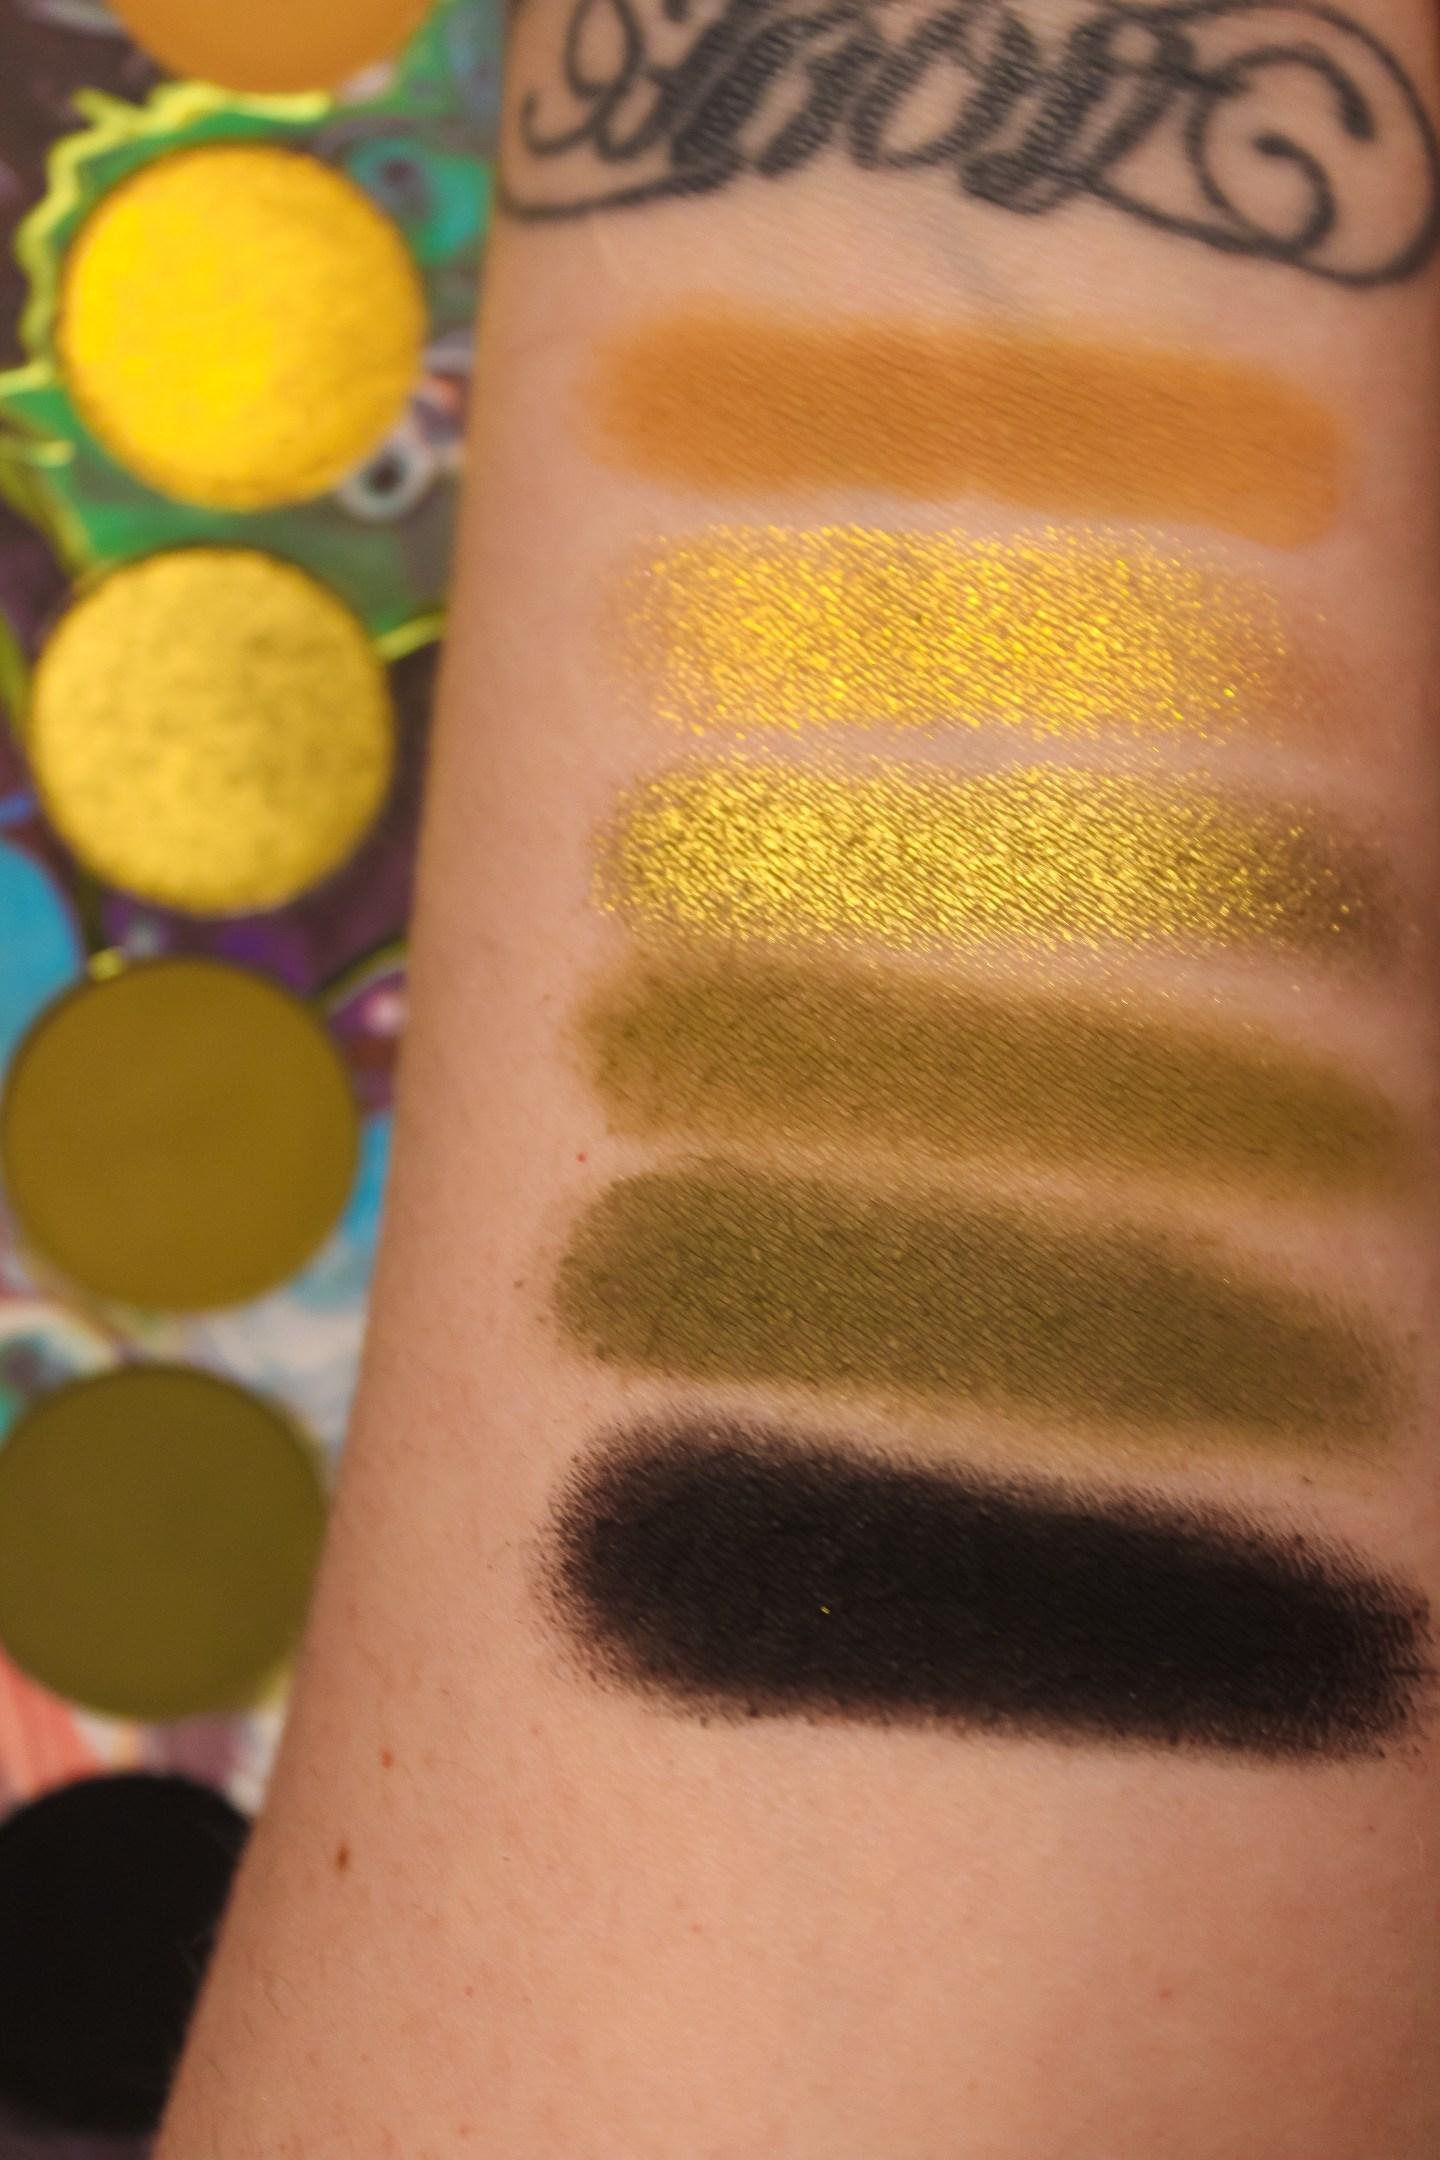 Kaleidos Makeup Futurism I-III Palettes Review 5